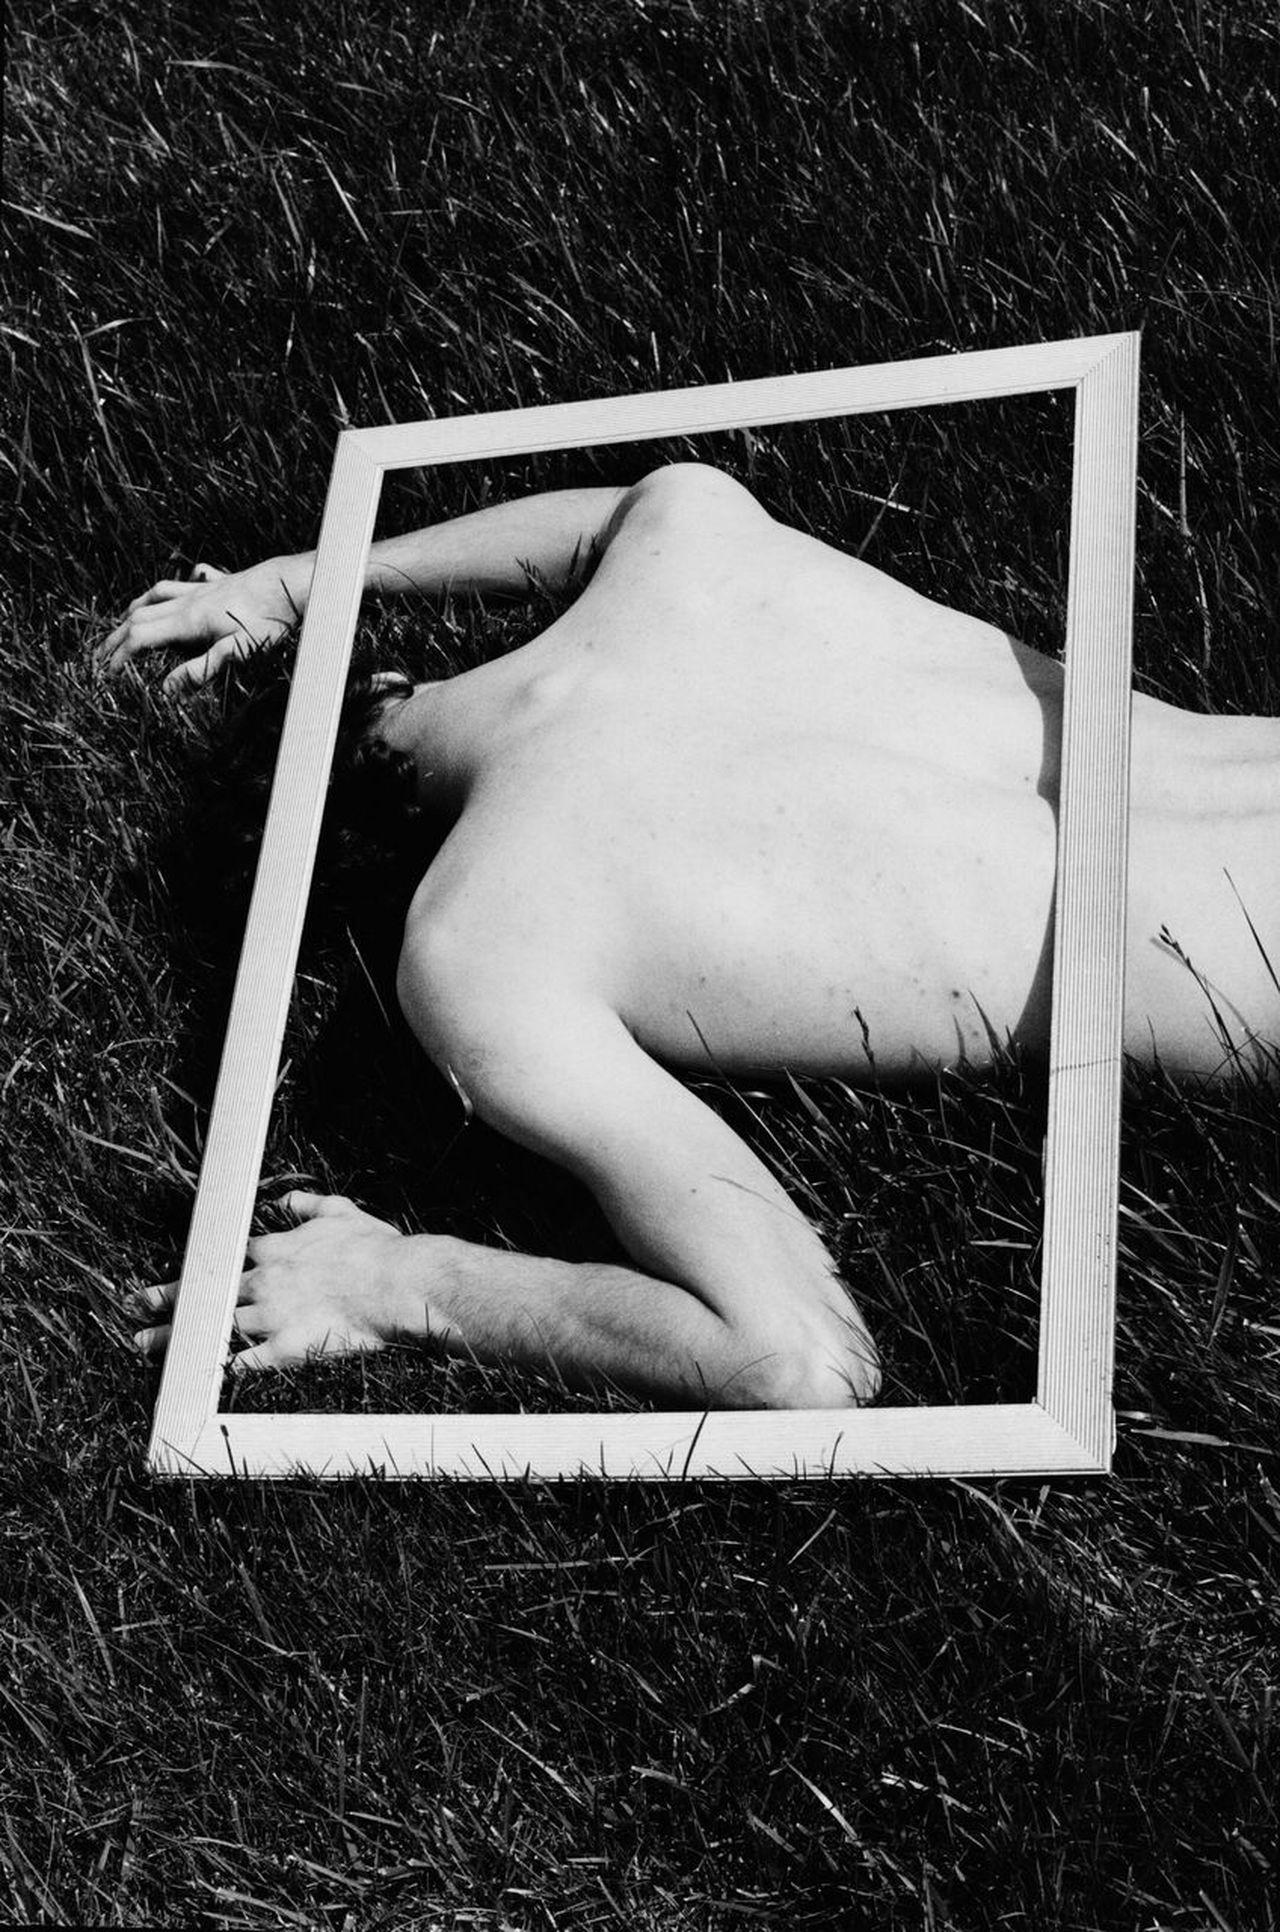 one person lying down people human body part outdoors Body Man Soul frame Analogue Photography 35mm film 35mm 35mm camera blackandwhite Kodak Kodak T-max 400